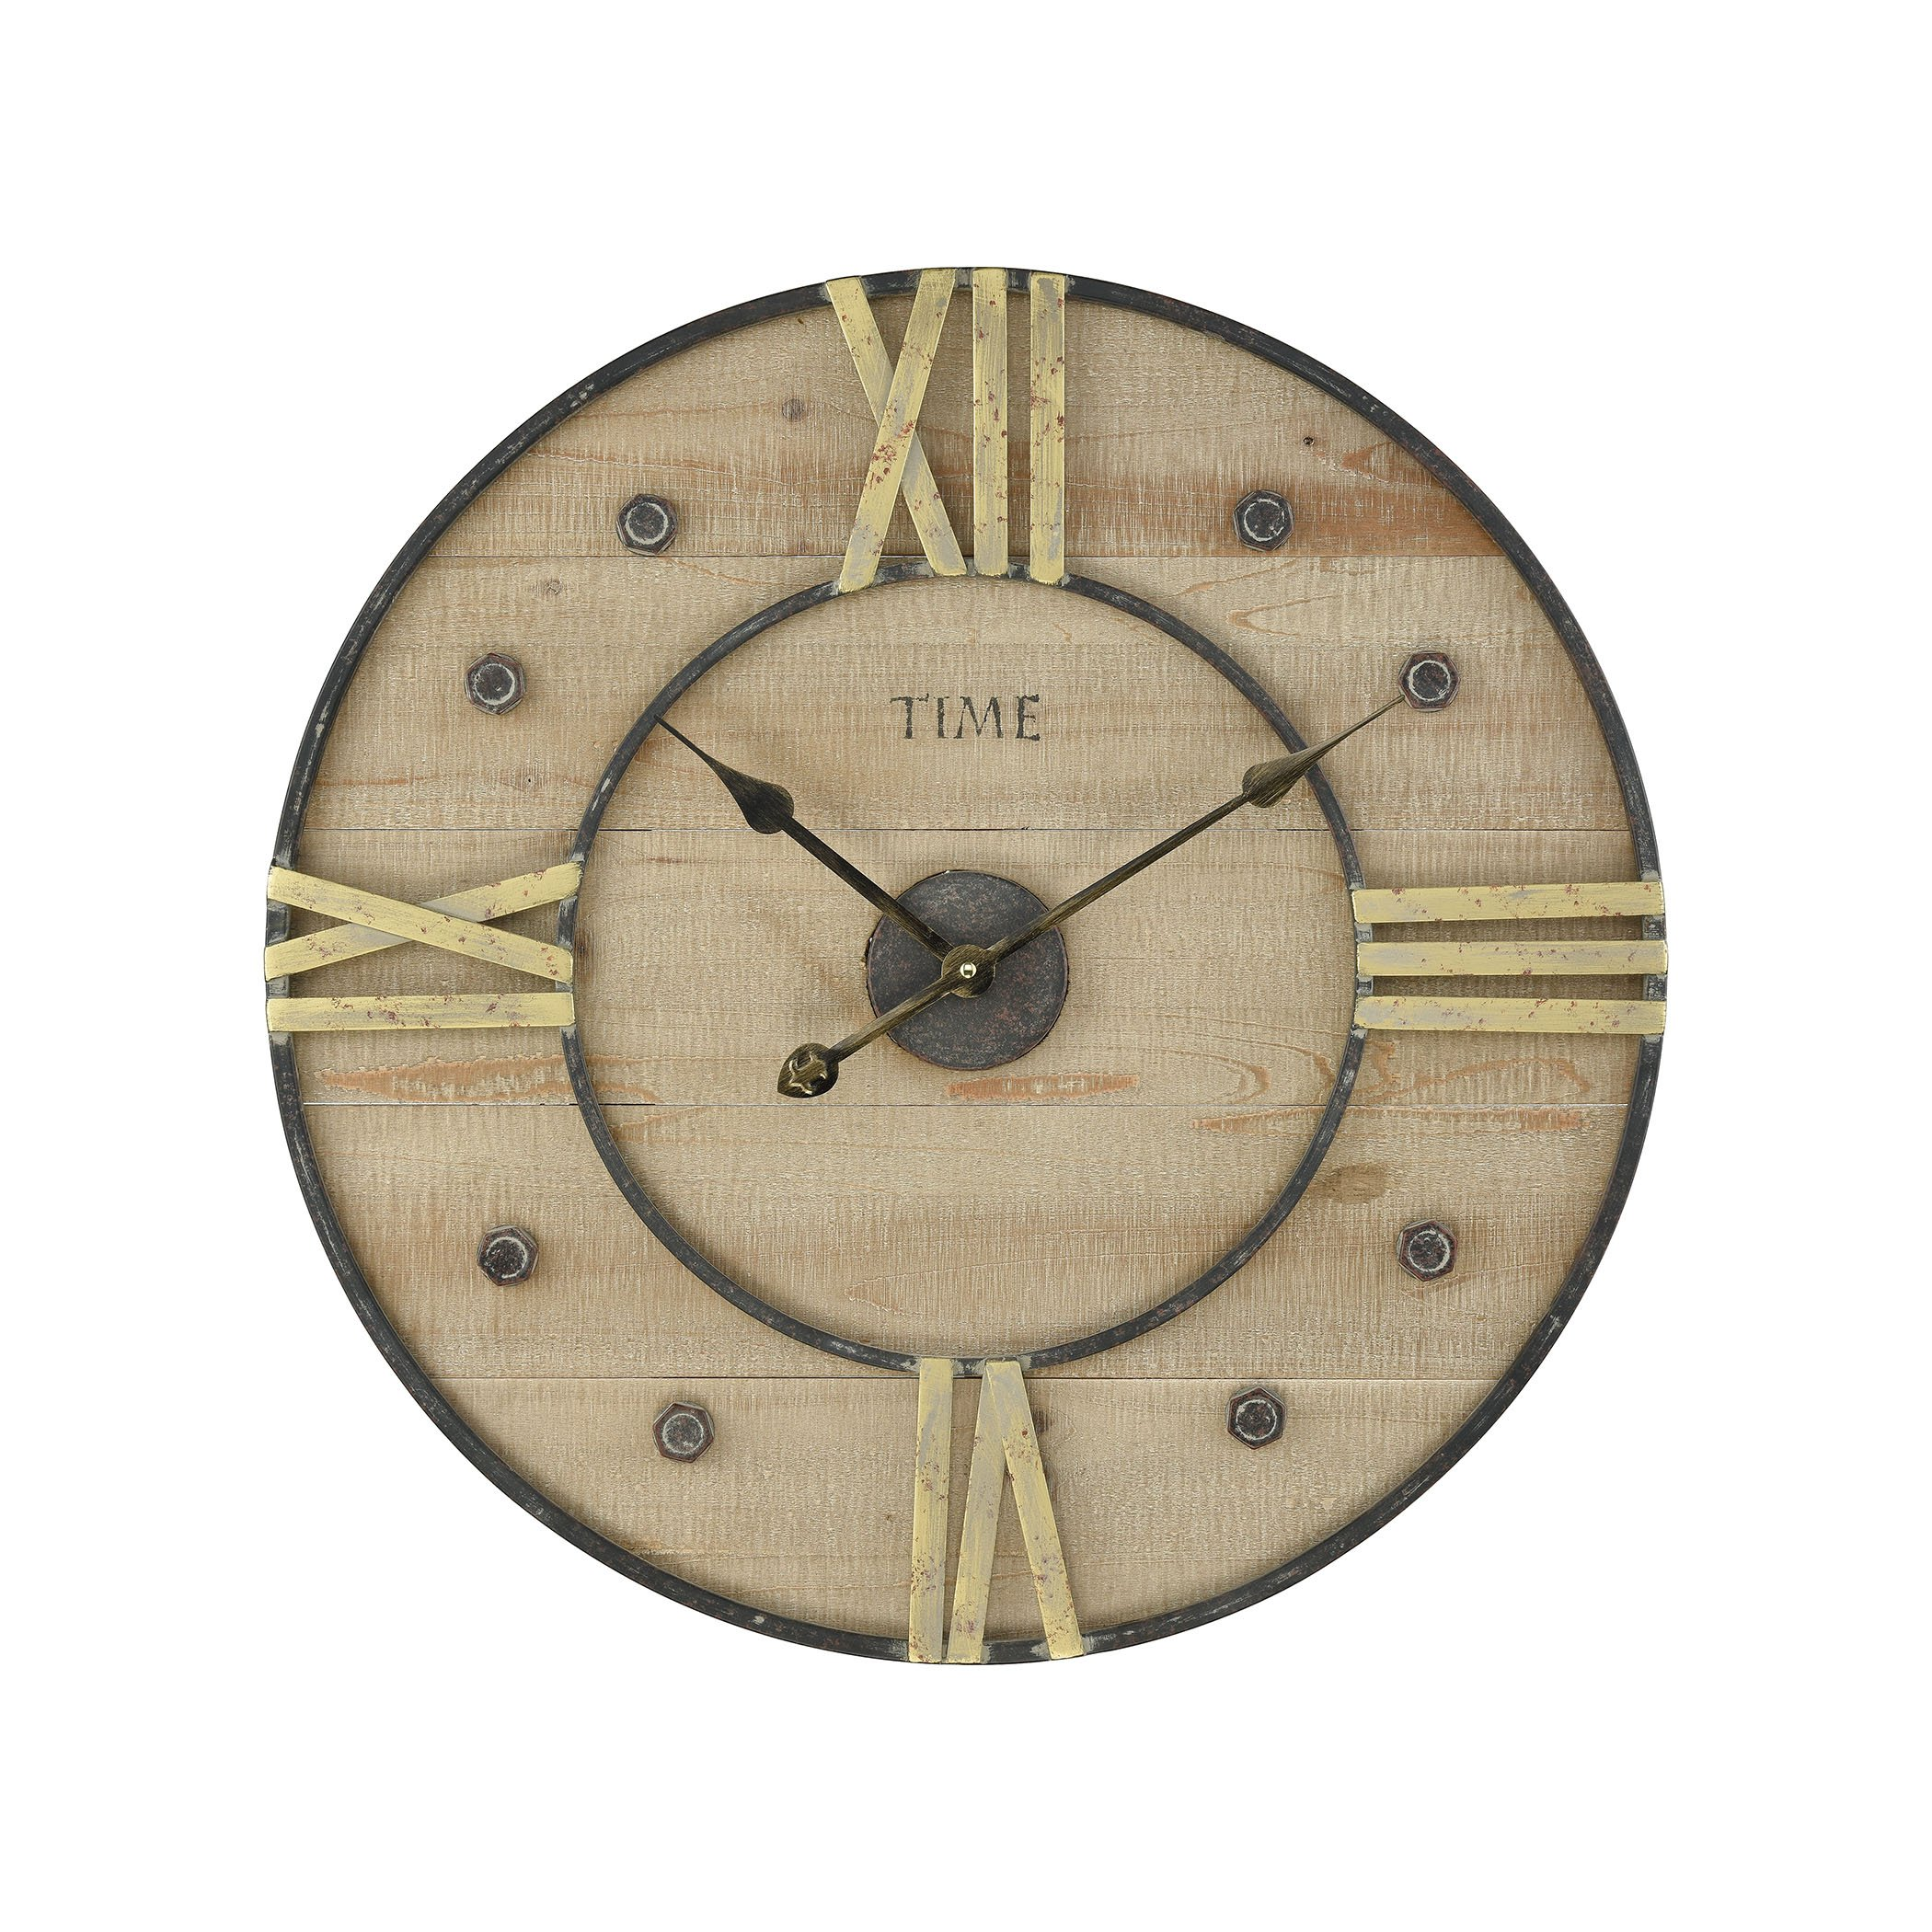 Pomeroy 916496 Cambridge Wall Clock by Pomeroy